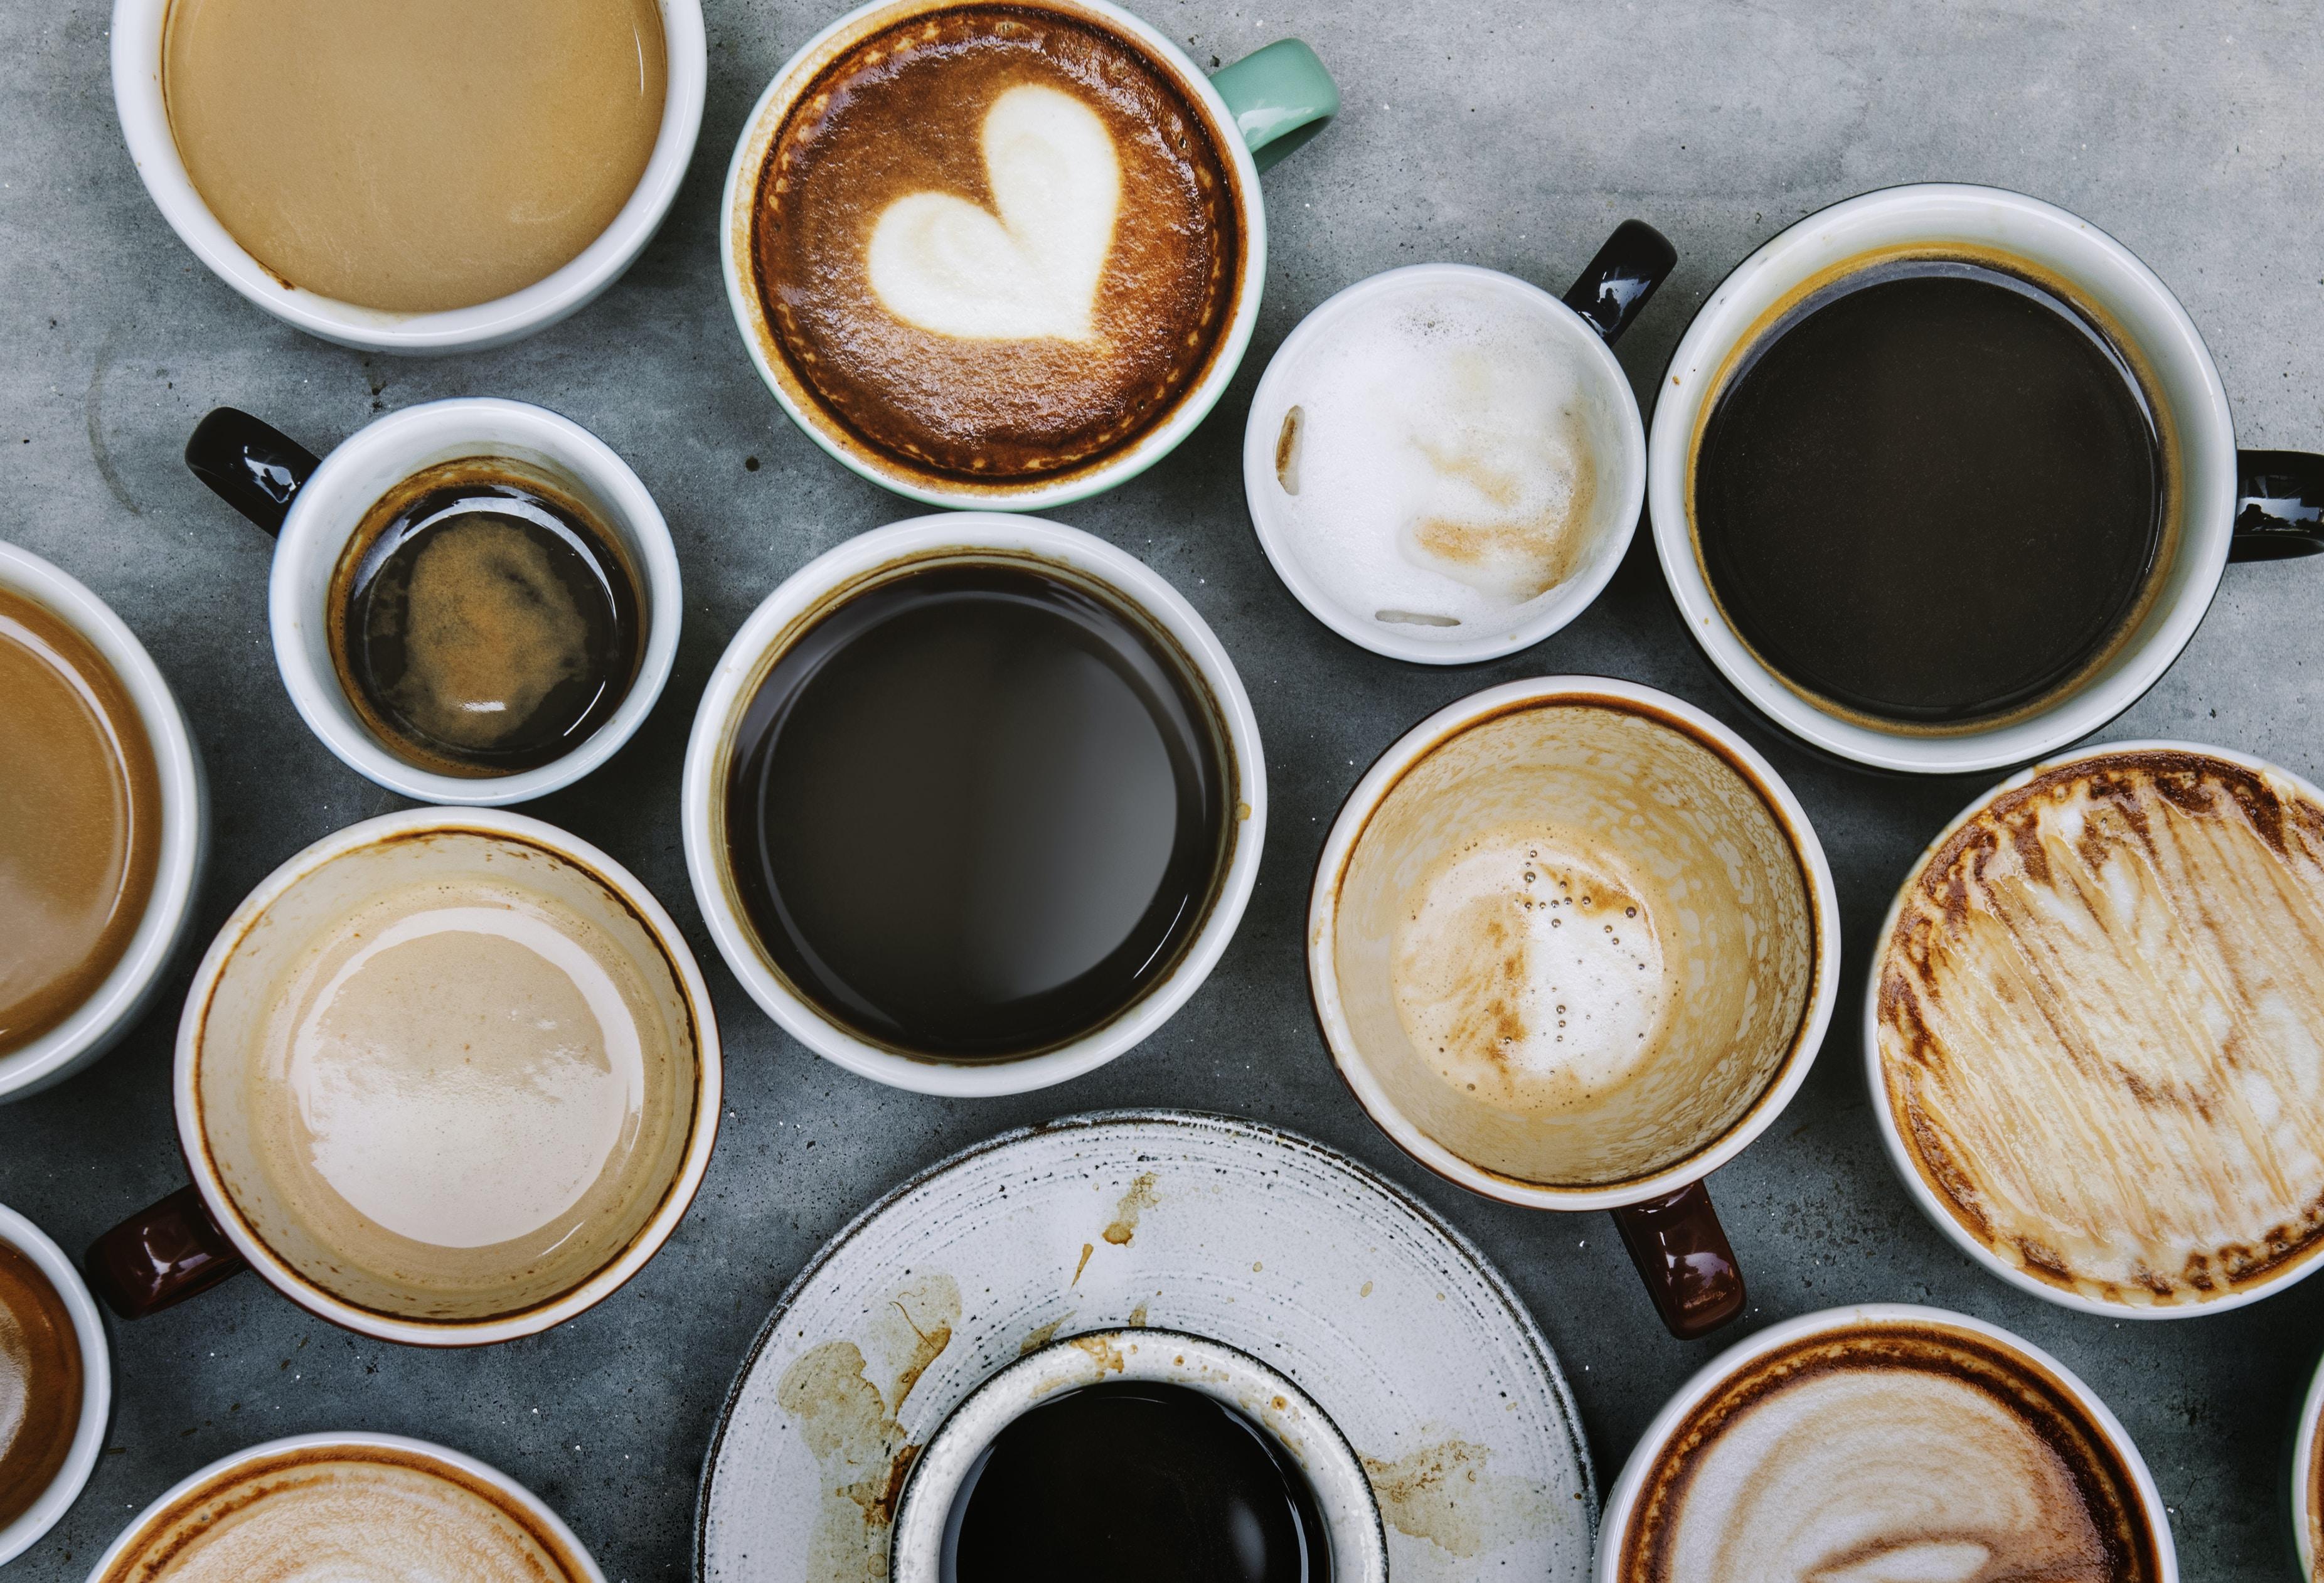 assorted coffee mugs